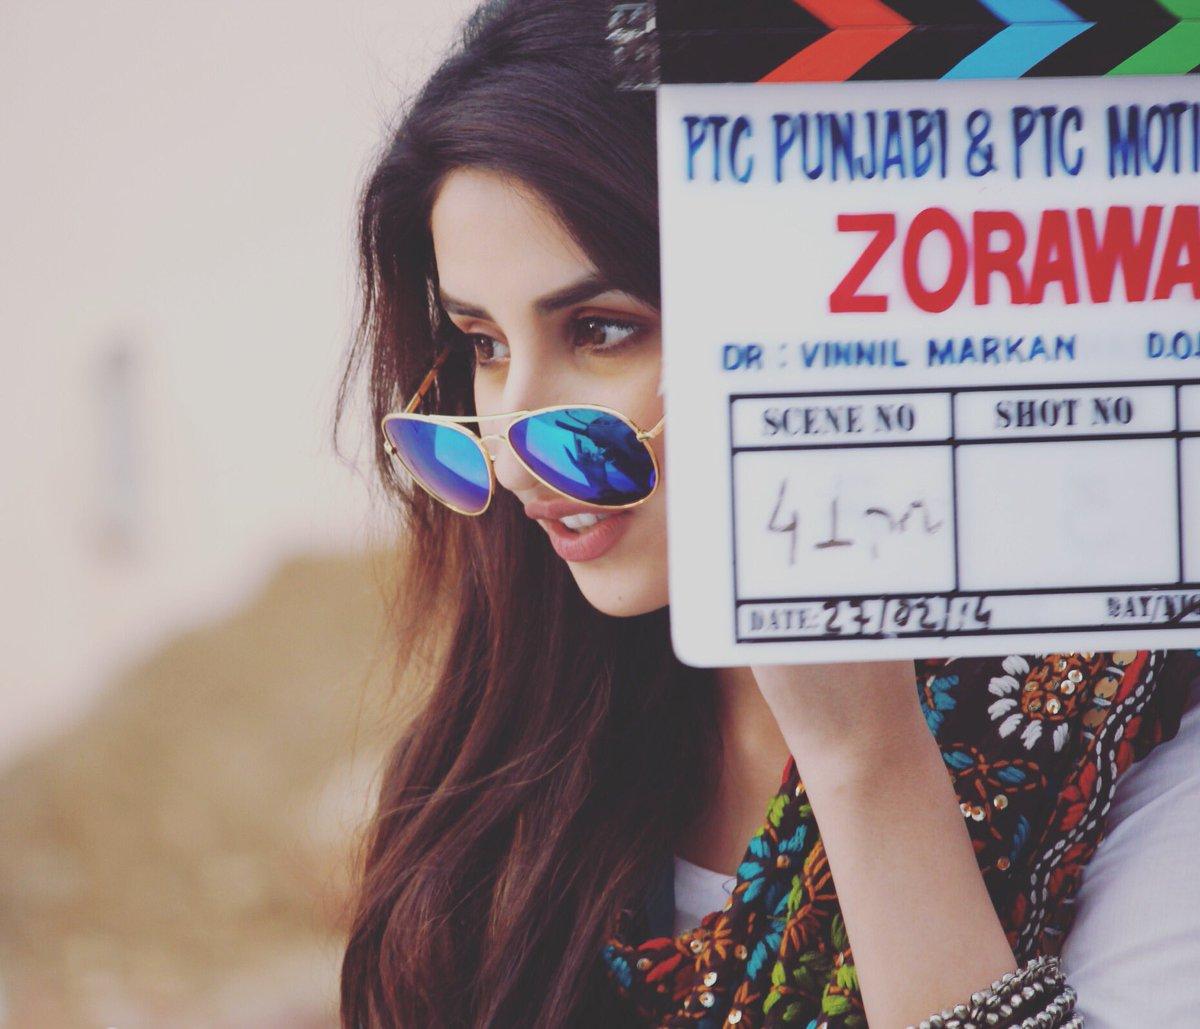 Thank you @purannalwa11 for an amazing shot @VinnilM @PTC_Network @ParulGulatiFC #zorawar #yoyohoneysingh https://t.co/YZOMcYME3x